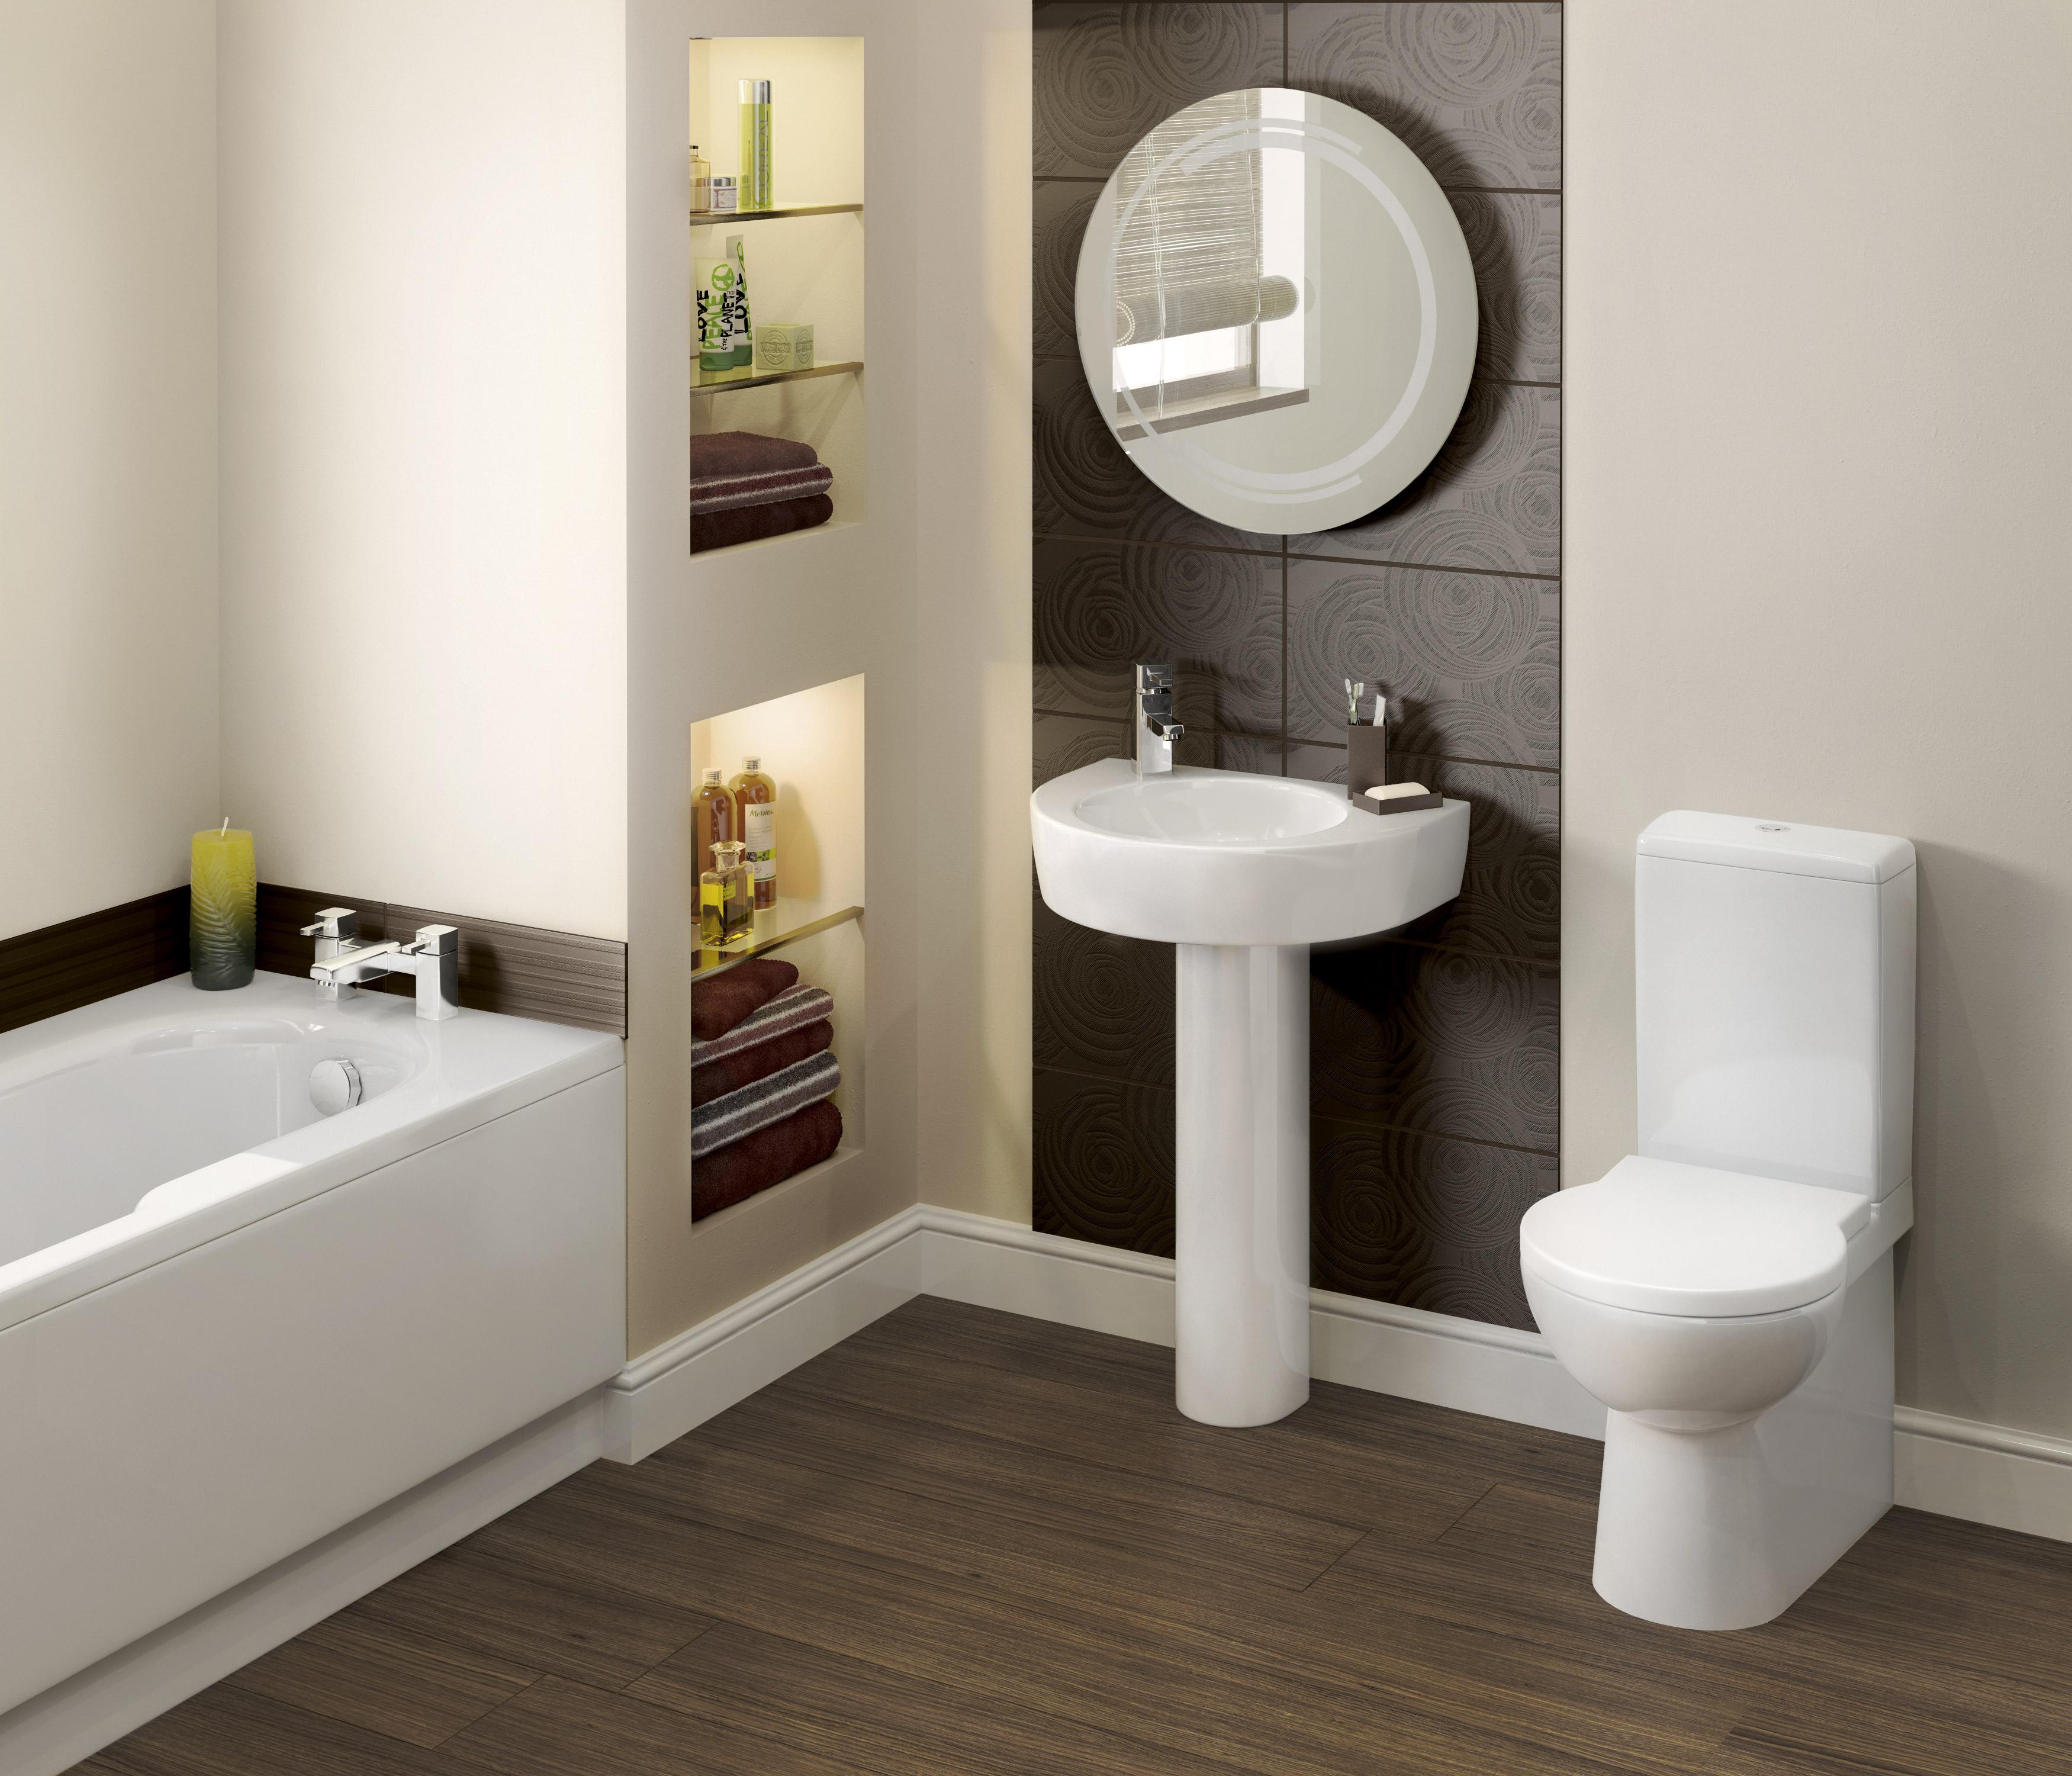 Free photo: Bathroom - Tiles, Toilet, Washroom - Free Download - Jooinn